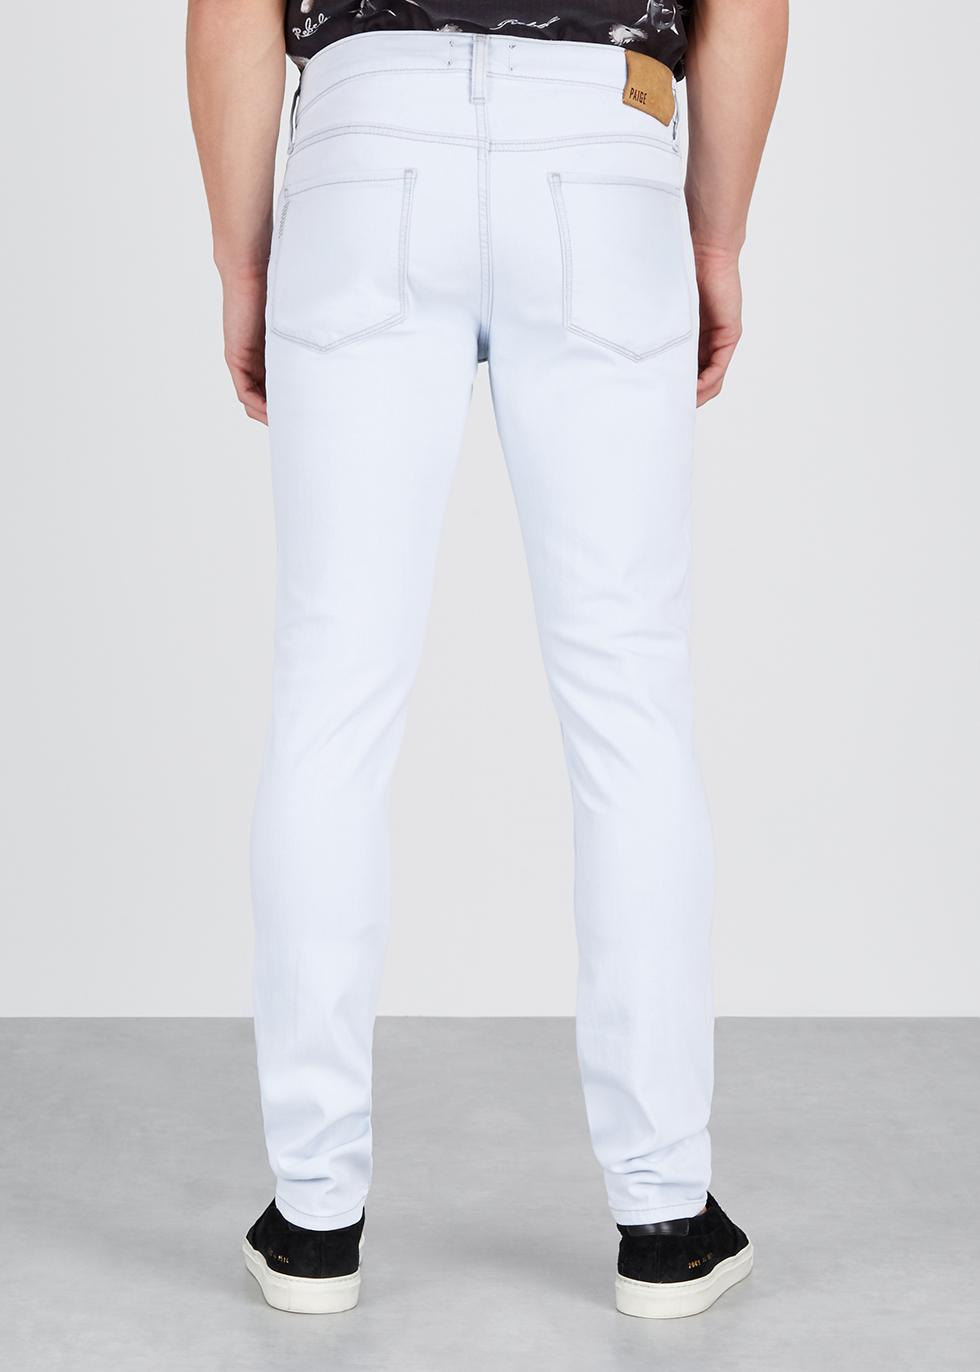 Croft light blue skinny jeans - Paige